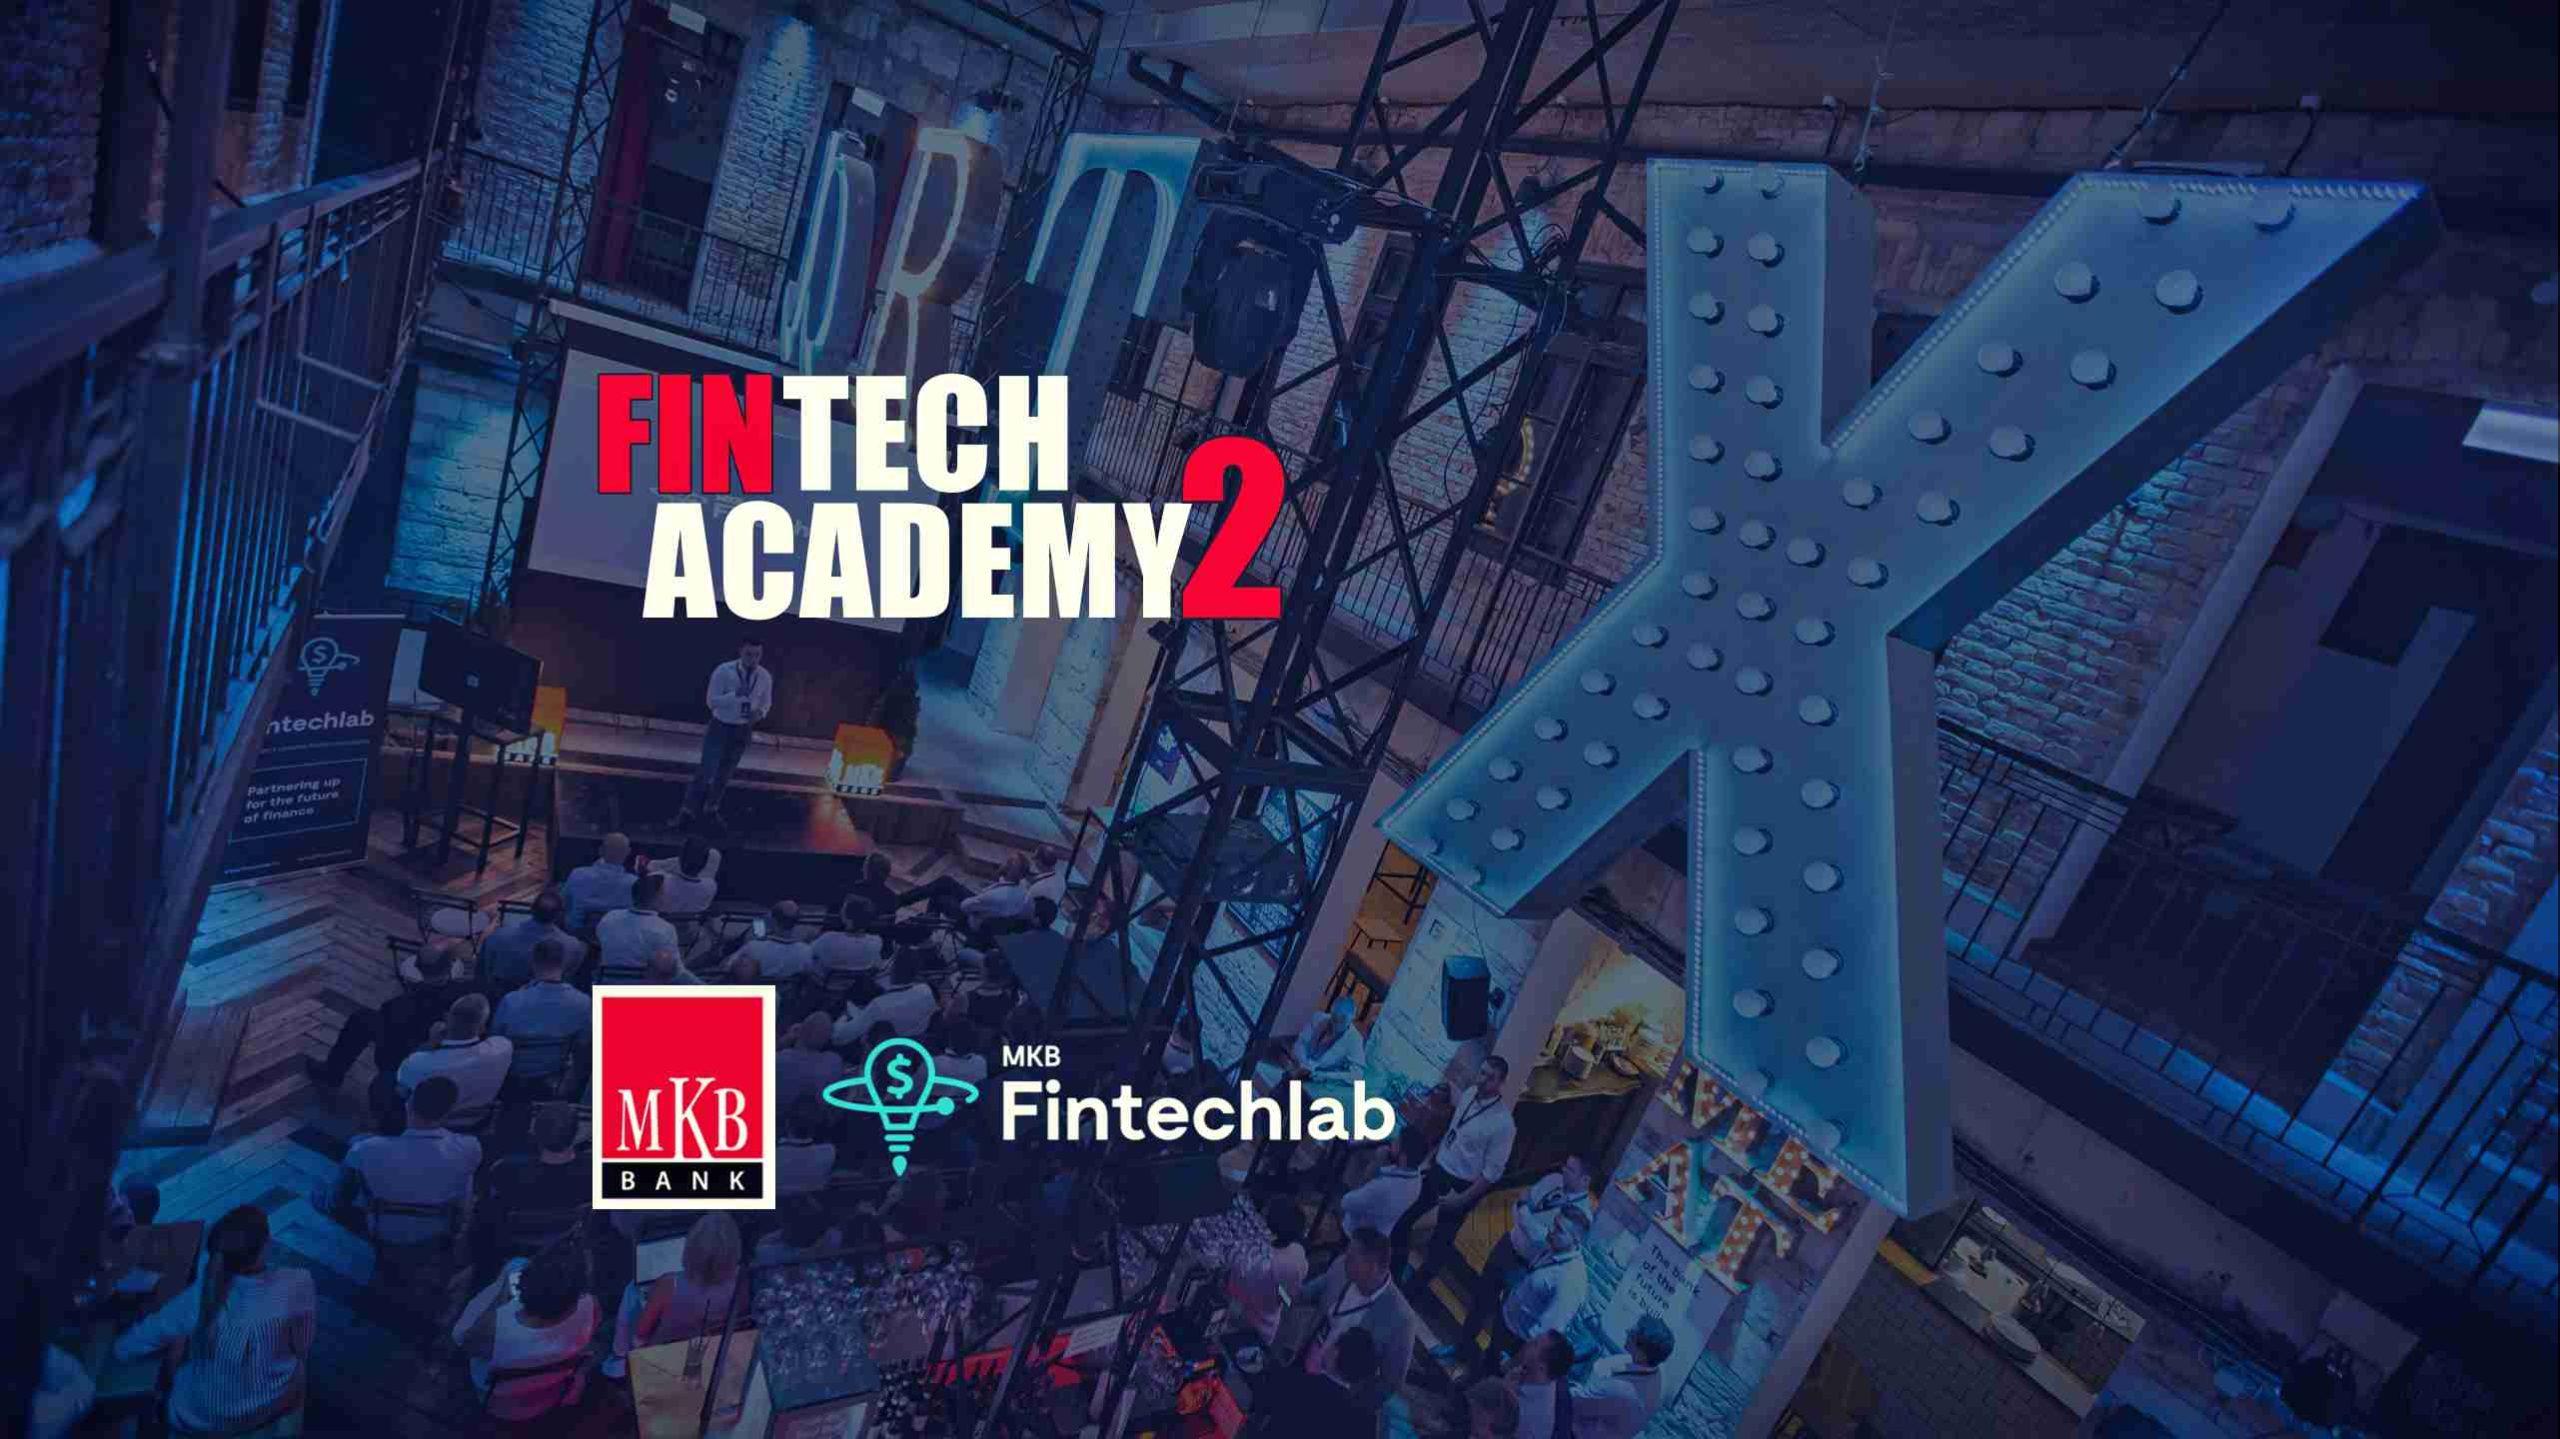 Fintech Akademia fintechlab MKB